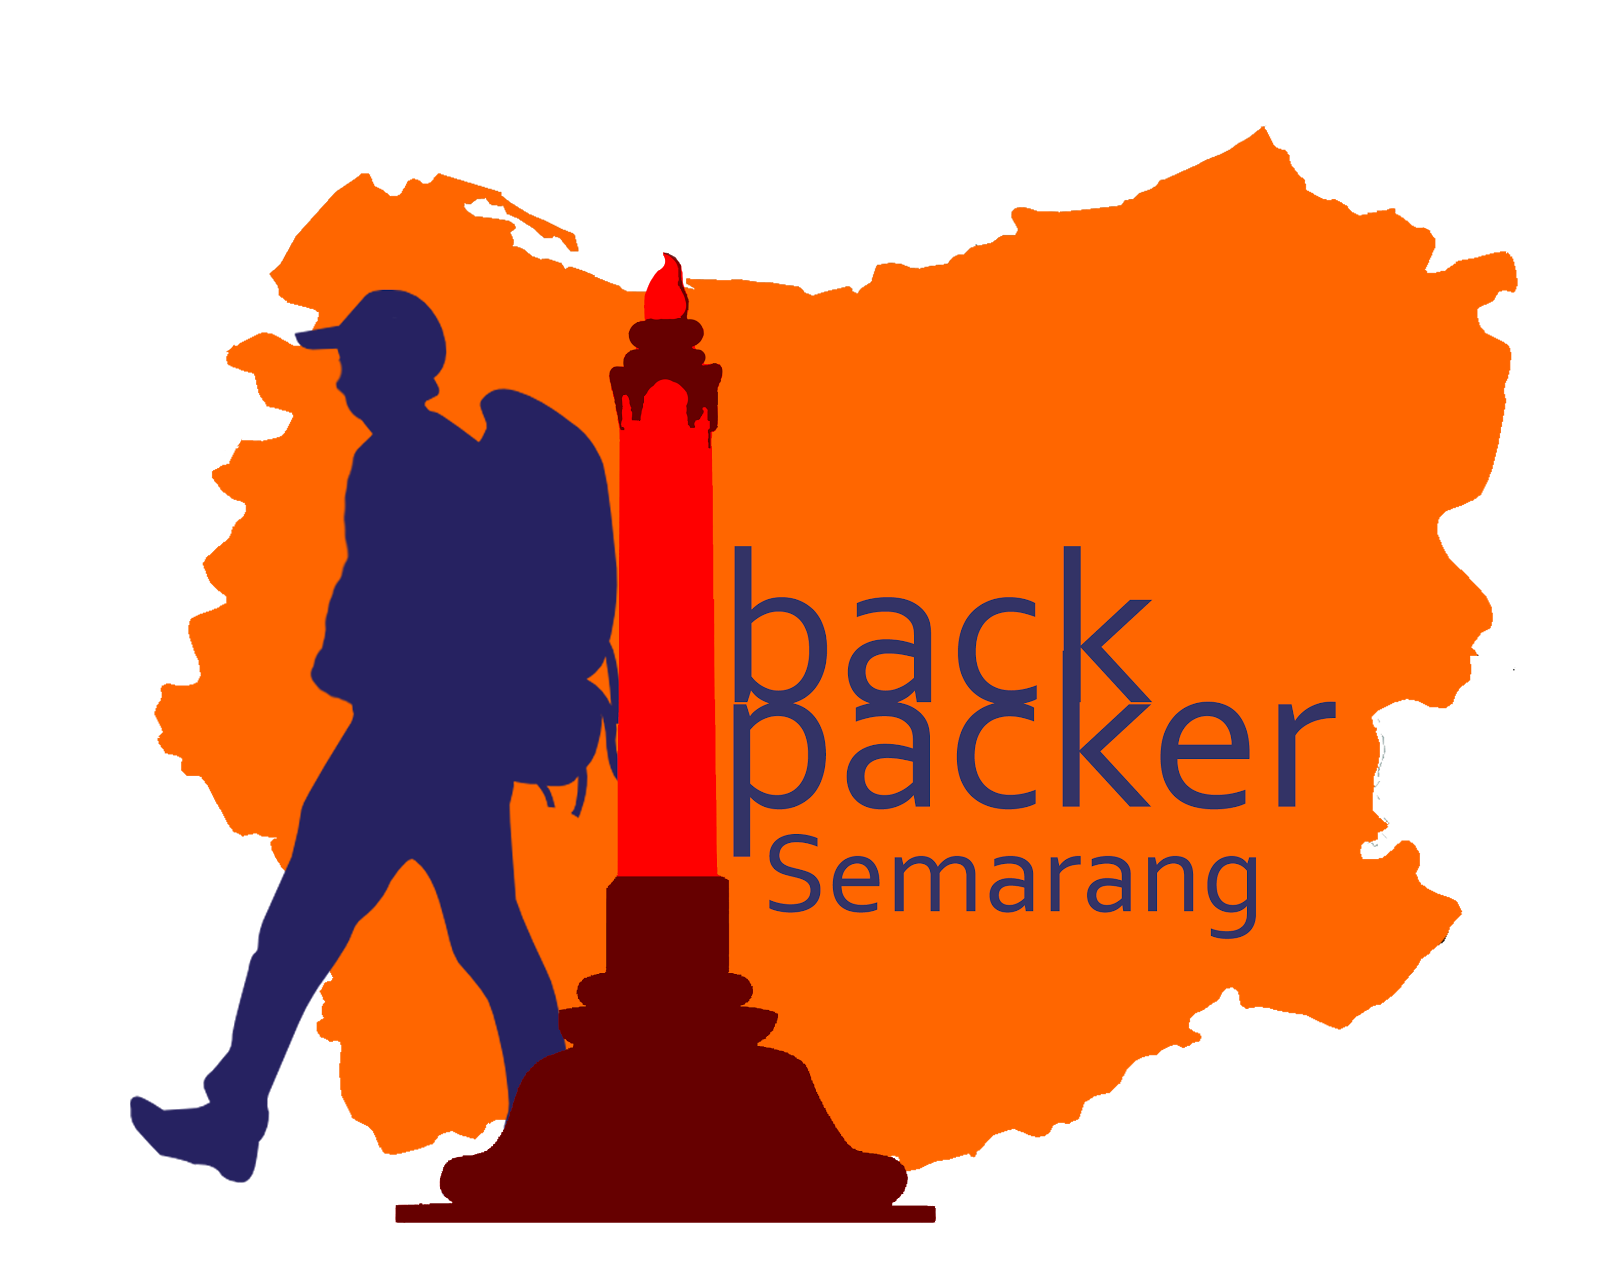 We Are Backpacker Semarang